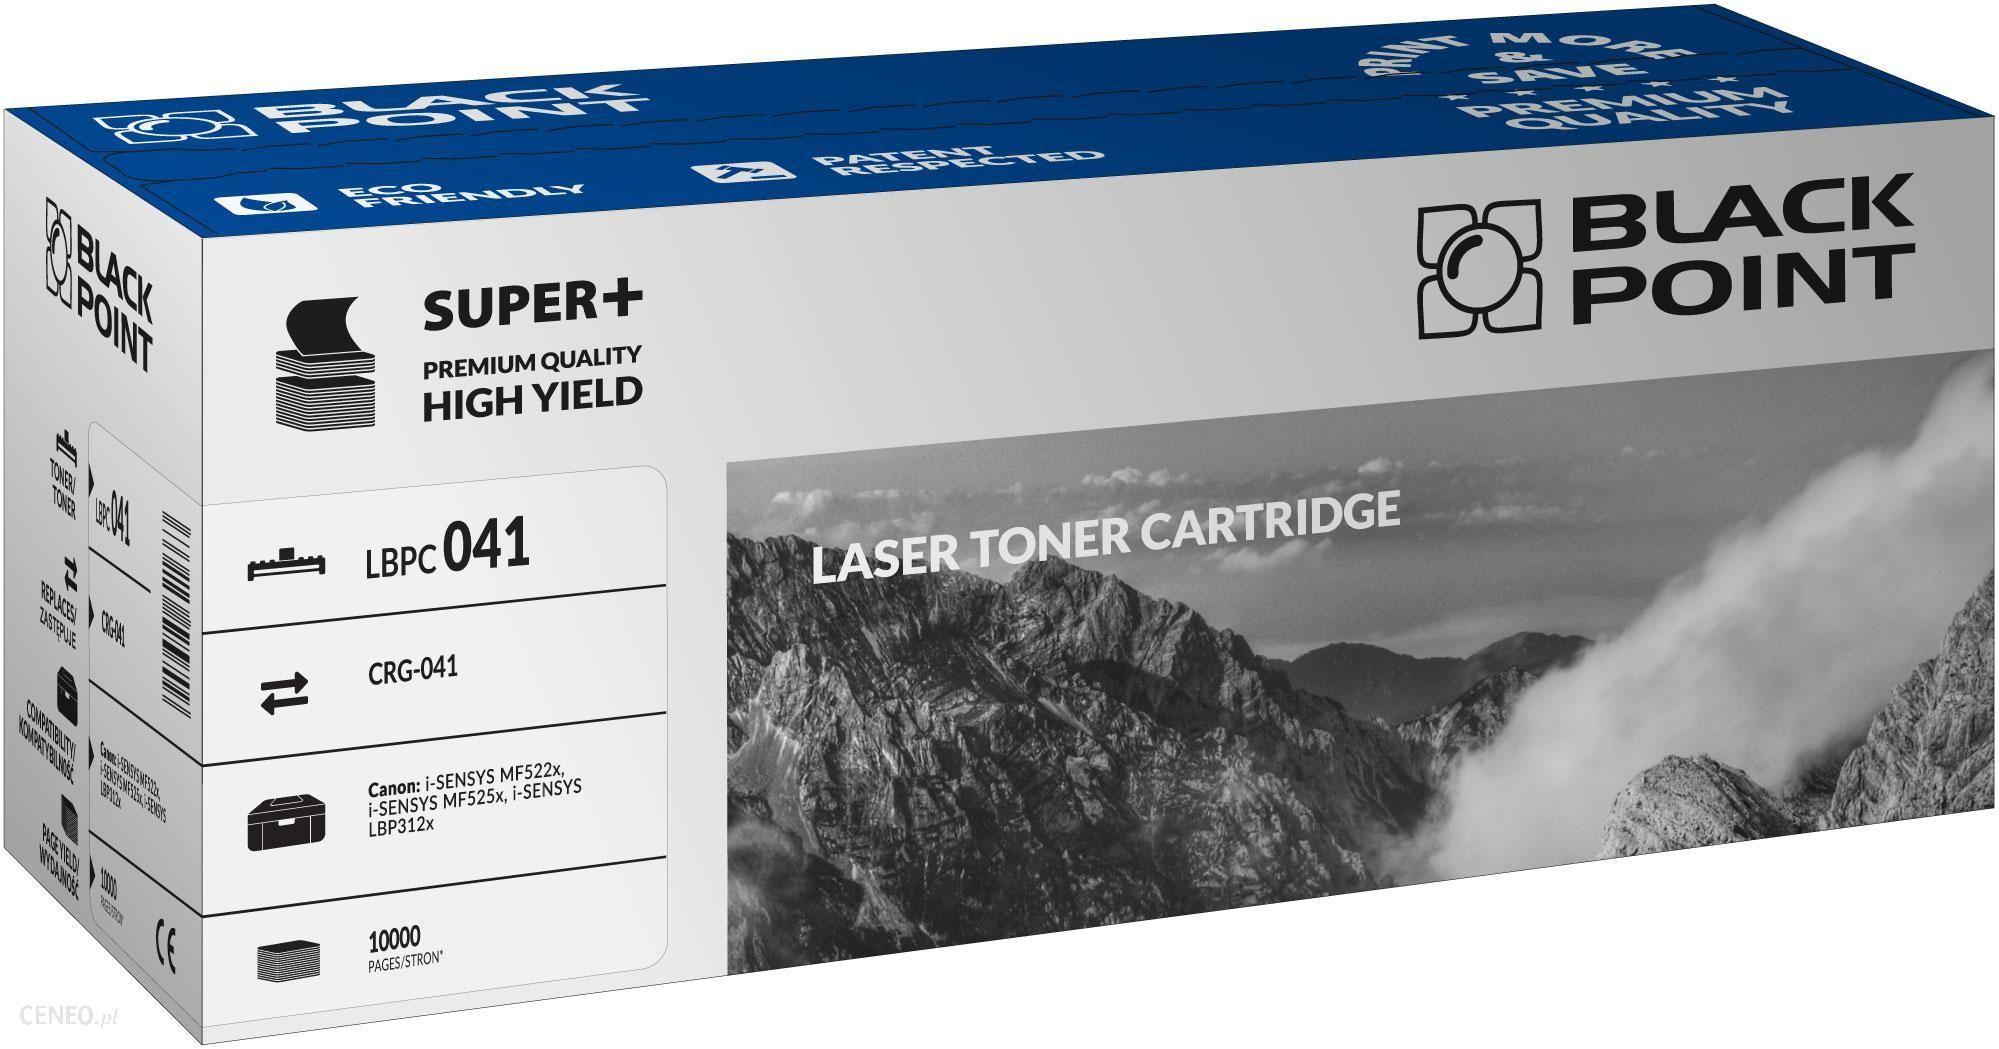 Black Point Zgodny z Canon CRG-041 Super PLUS do Canon i-SENSYS MF522x, i-SENSYS MF525x, i-SENSYS LBP312x